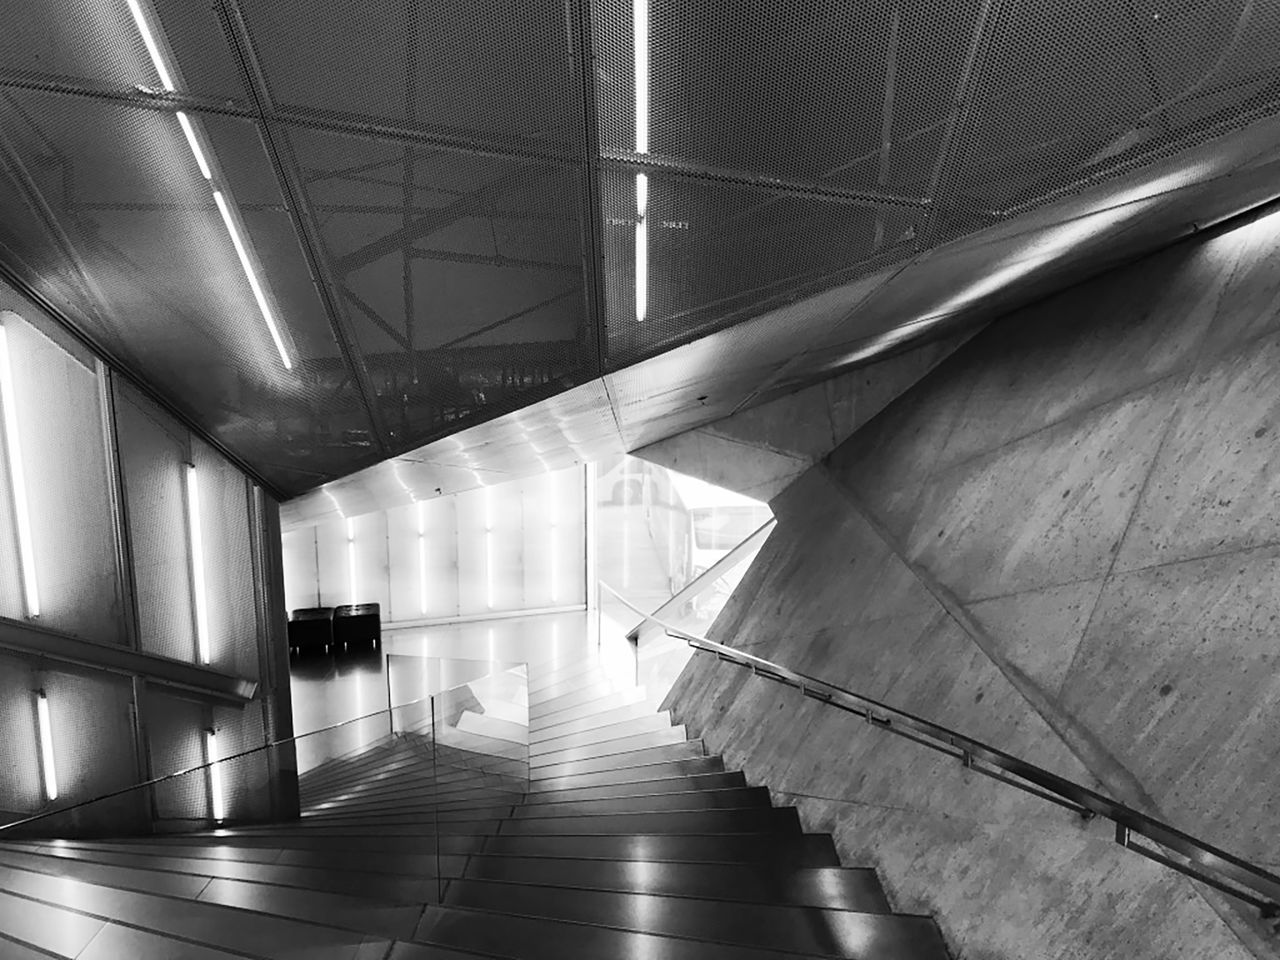 Architecture Casadamusica EyeEmNewHere Illuminated Koolhaas Modern Porto Portugal REM Staircase TCPM